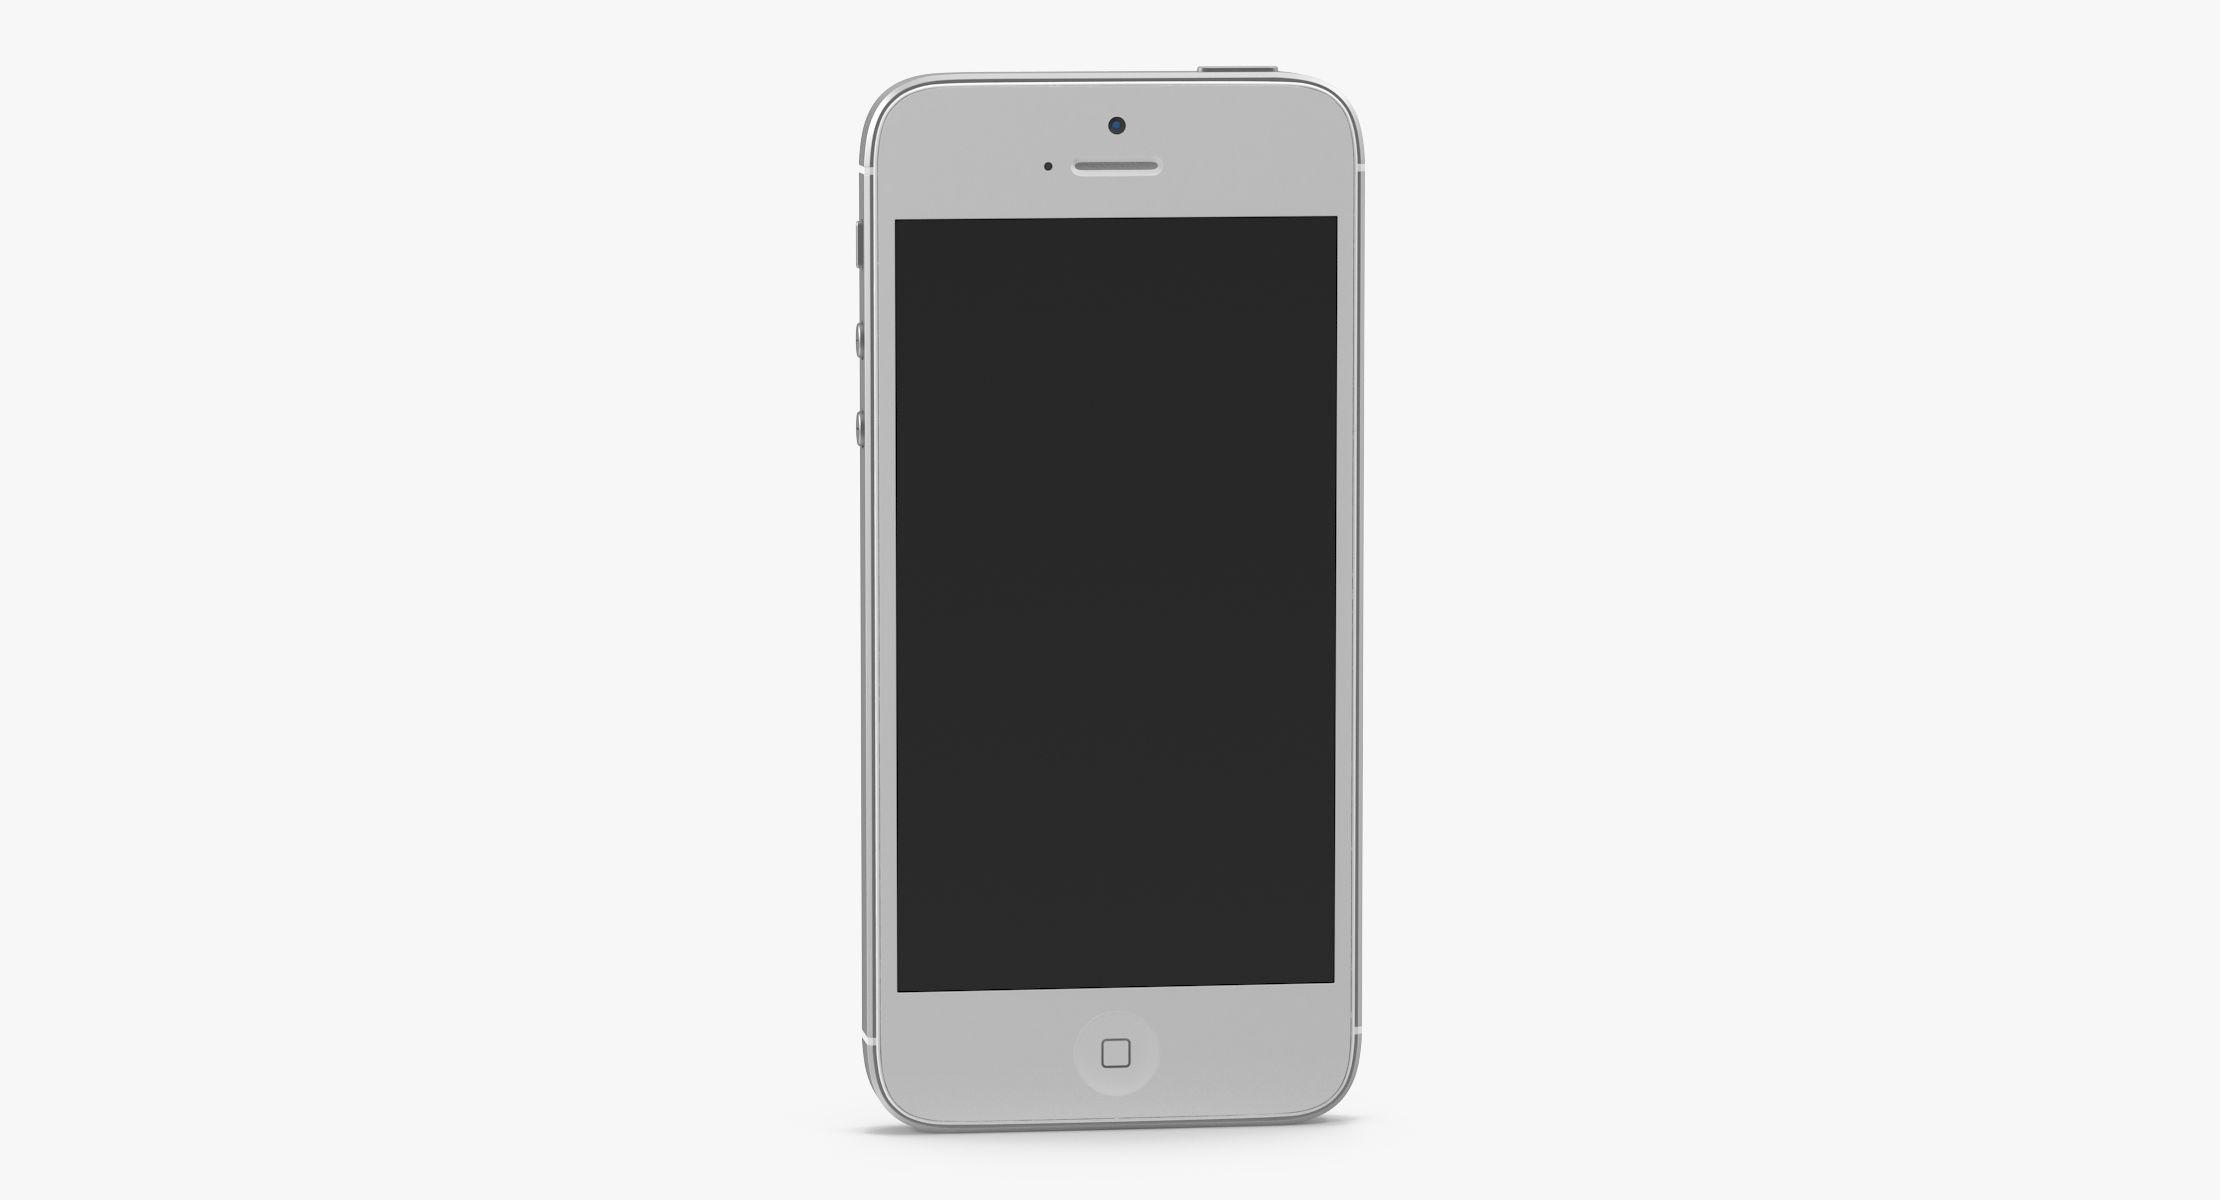 iPhone 5 - reel 1